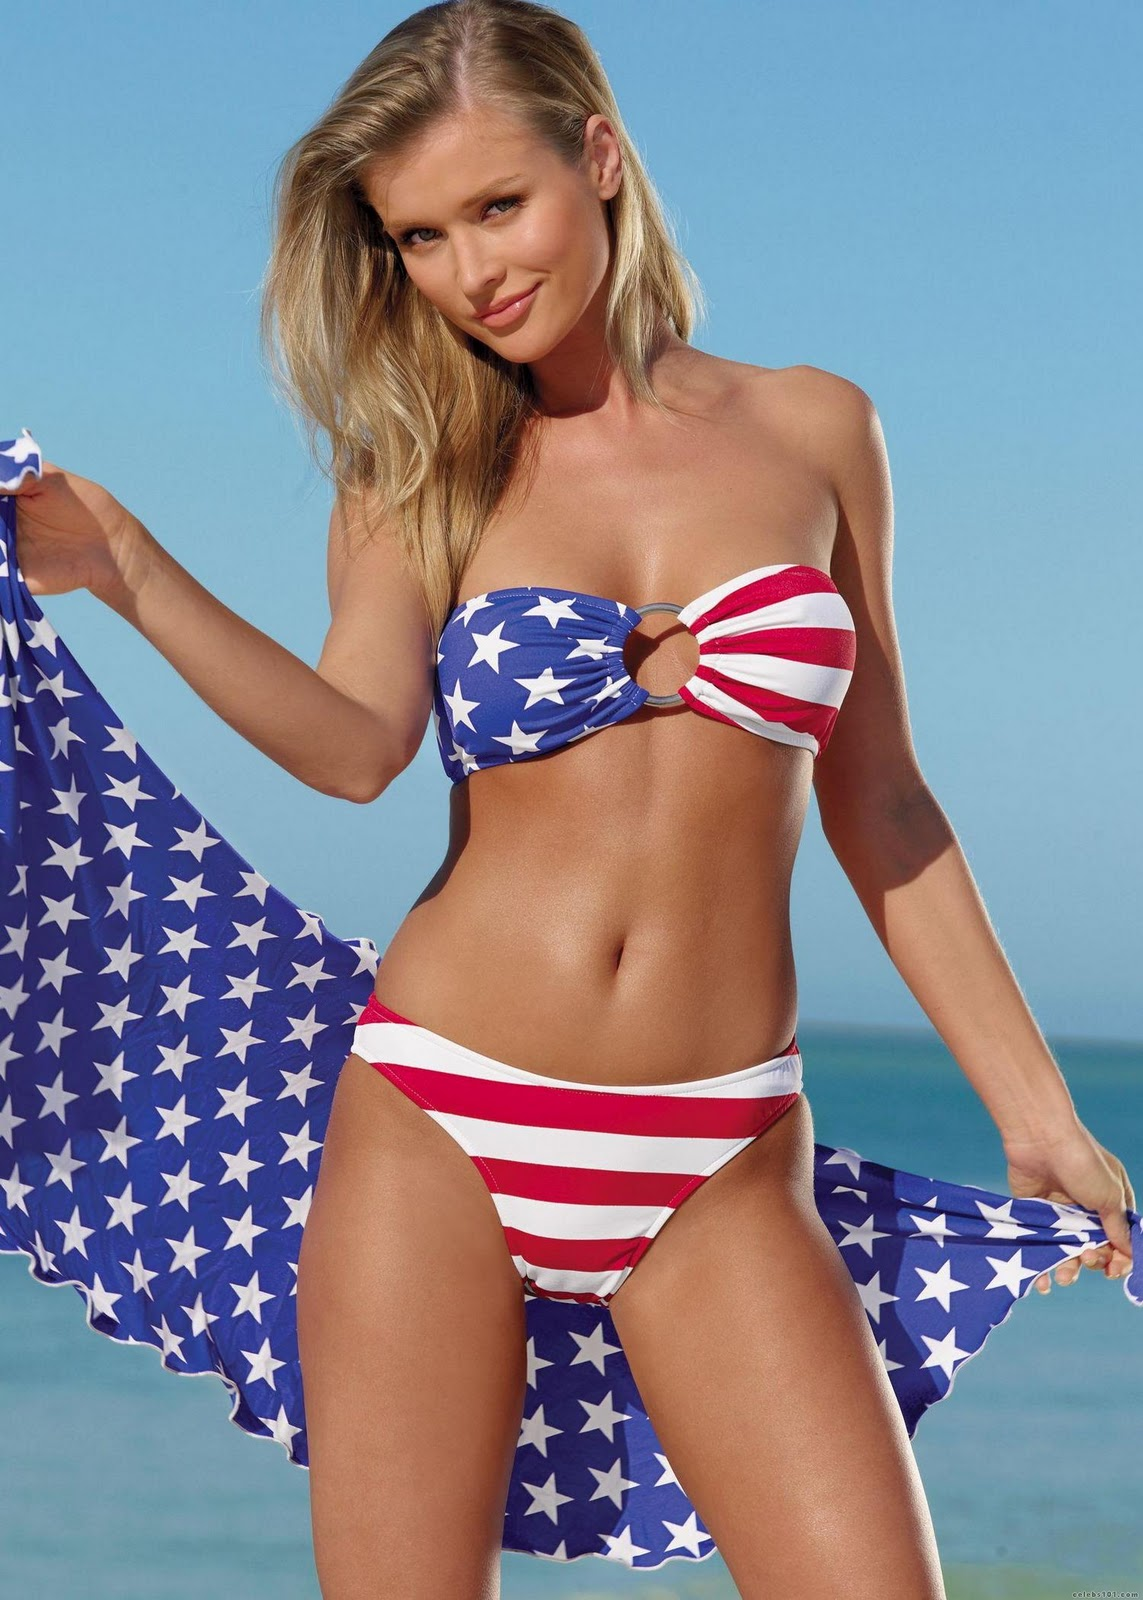 http://2.bp.blogspot.com/-KOvYIl4k2gs/Txo44lMrprI/AAAAAAAAEjQ/AitcLU0lucg/s1600/Joanna+Krupa+Bikini+%25289%2529.jpg